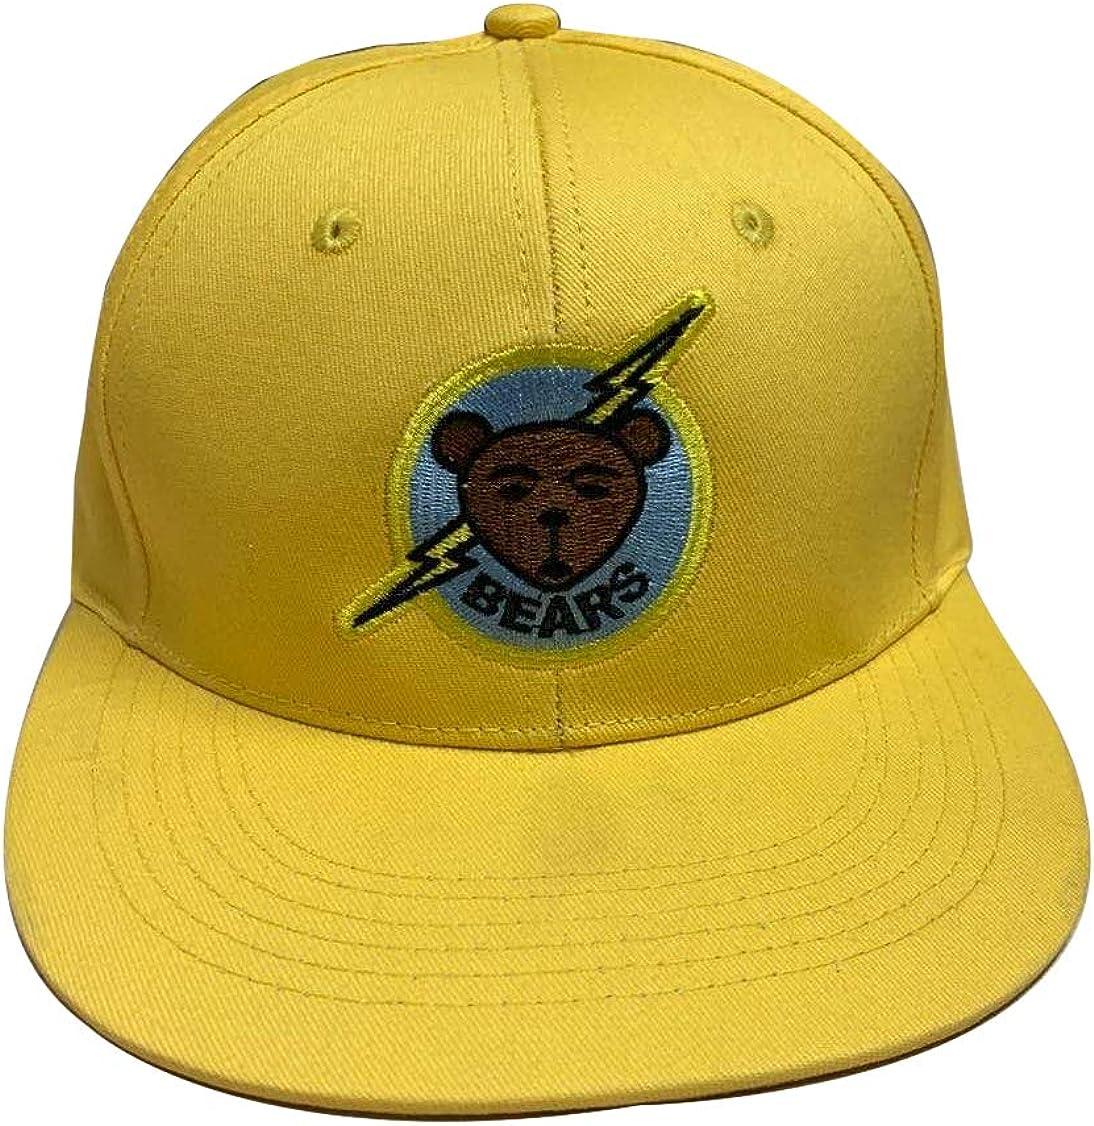 borizcustoms Bad News Bears Baseball Hat Adjustable Buckle Slide New Stitch Cap Ultra Yellow